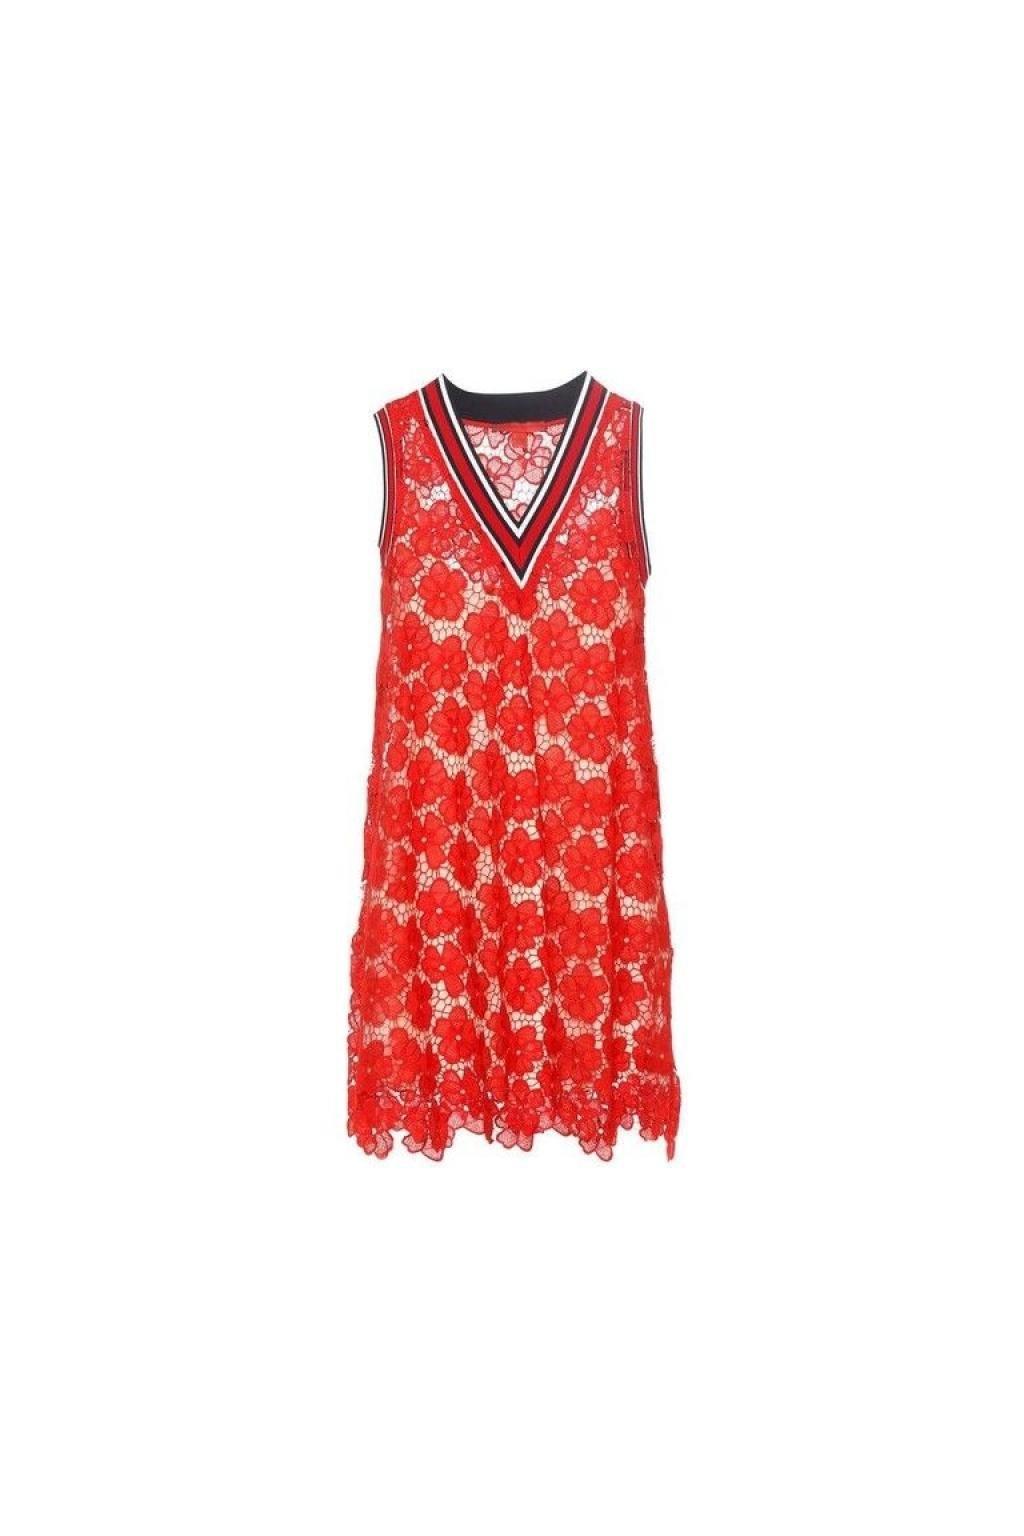 Dámské šaty Tommy Hilfiger RW0RW00027